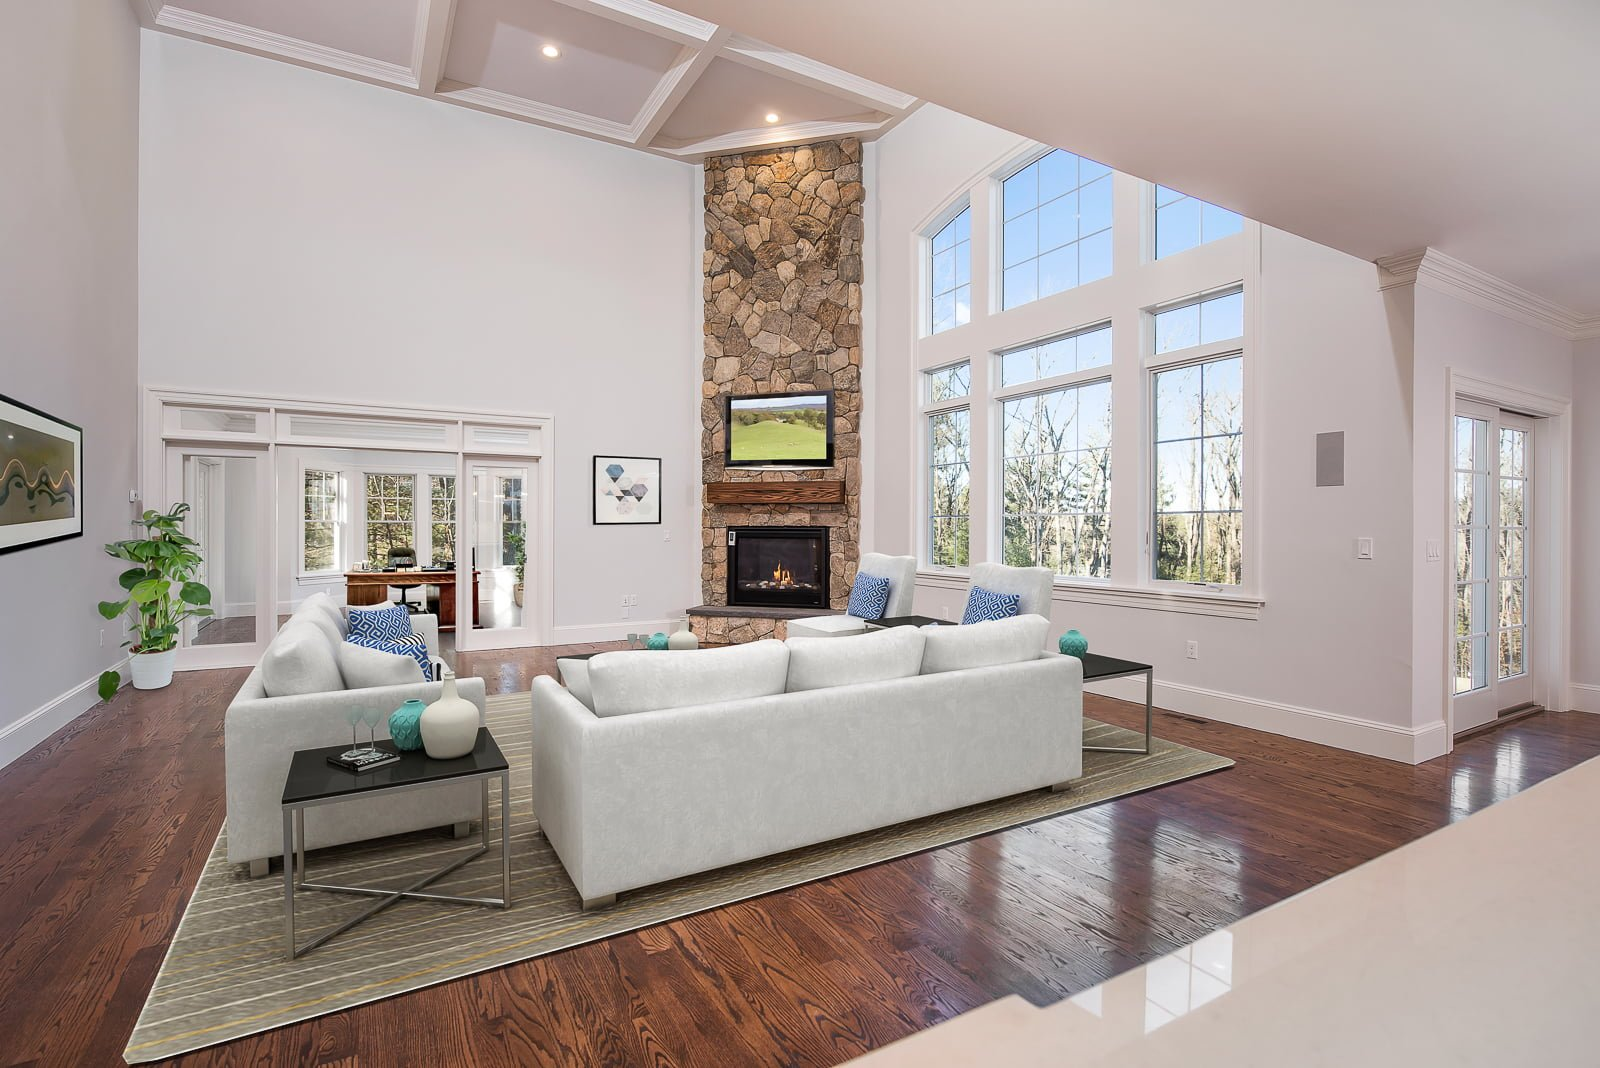 Boston Real Estate Photographer | Greg Moine Photography